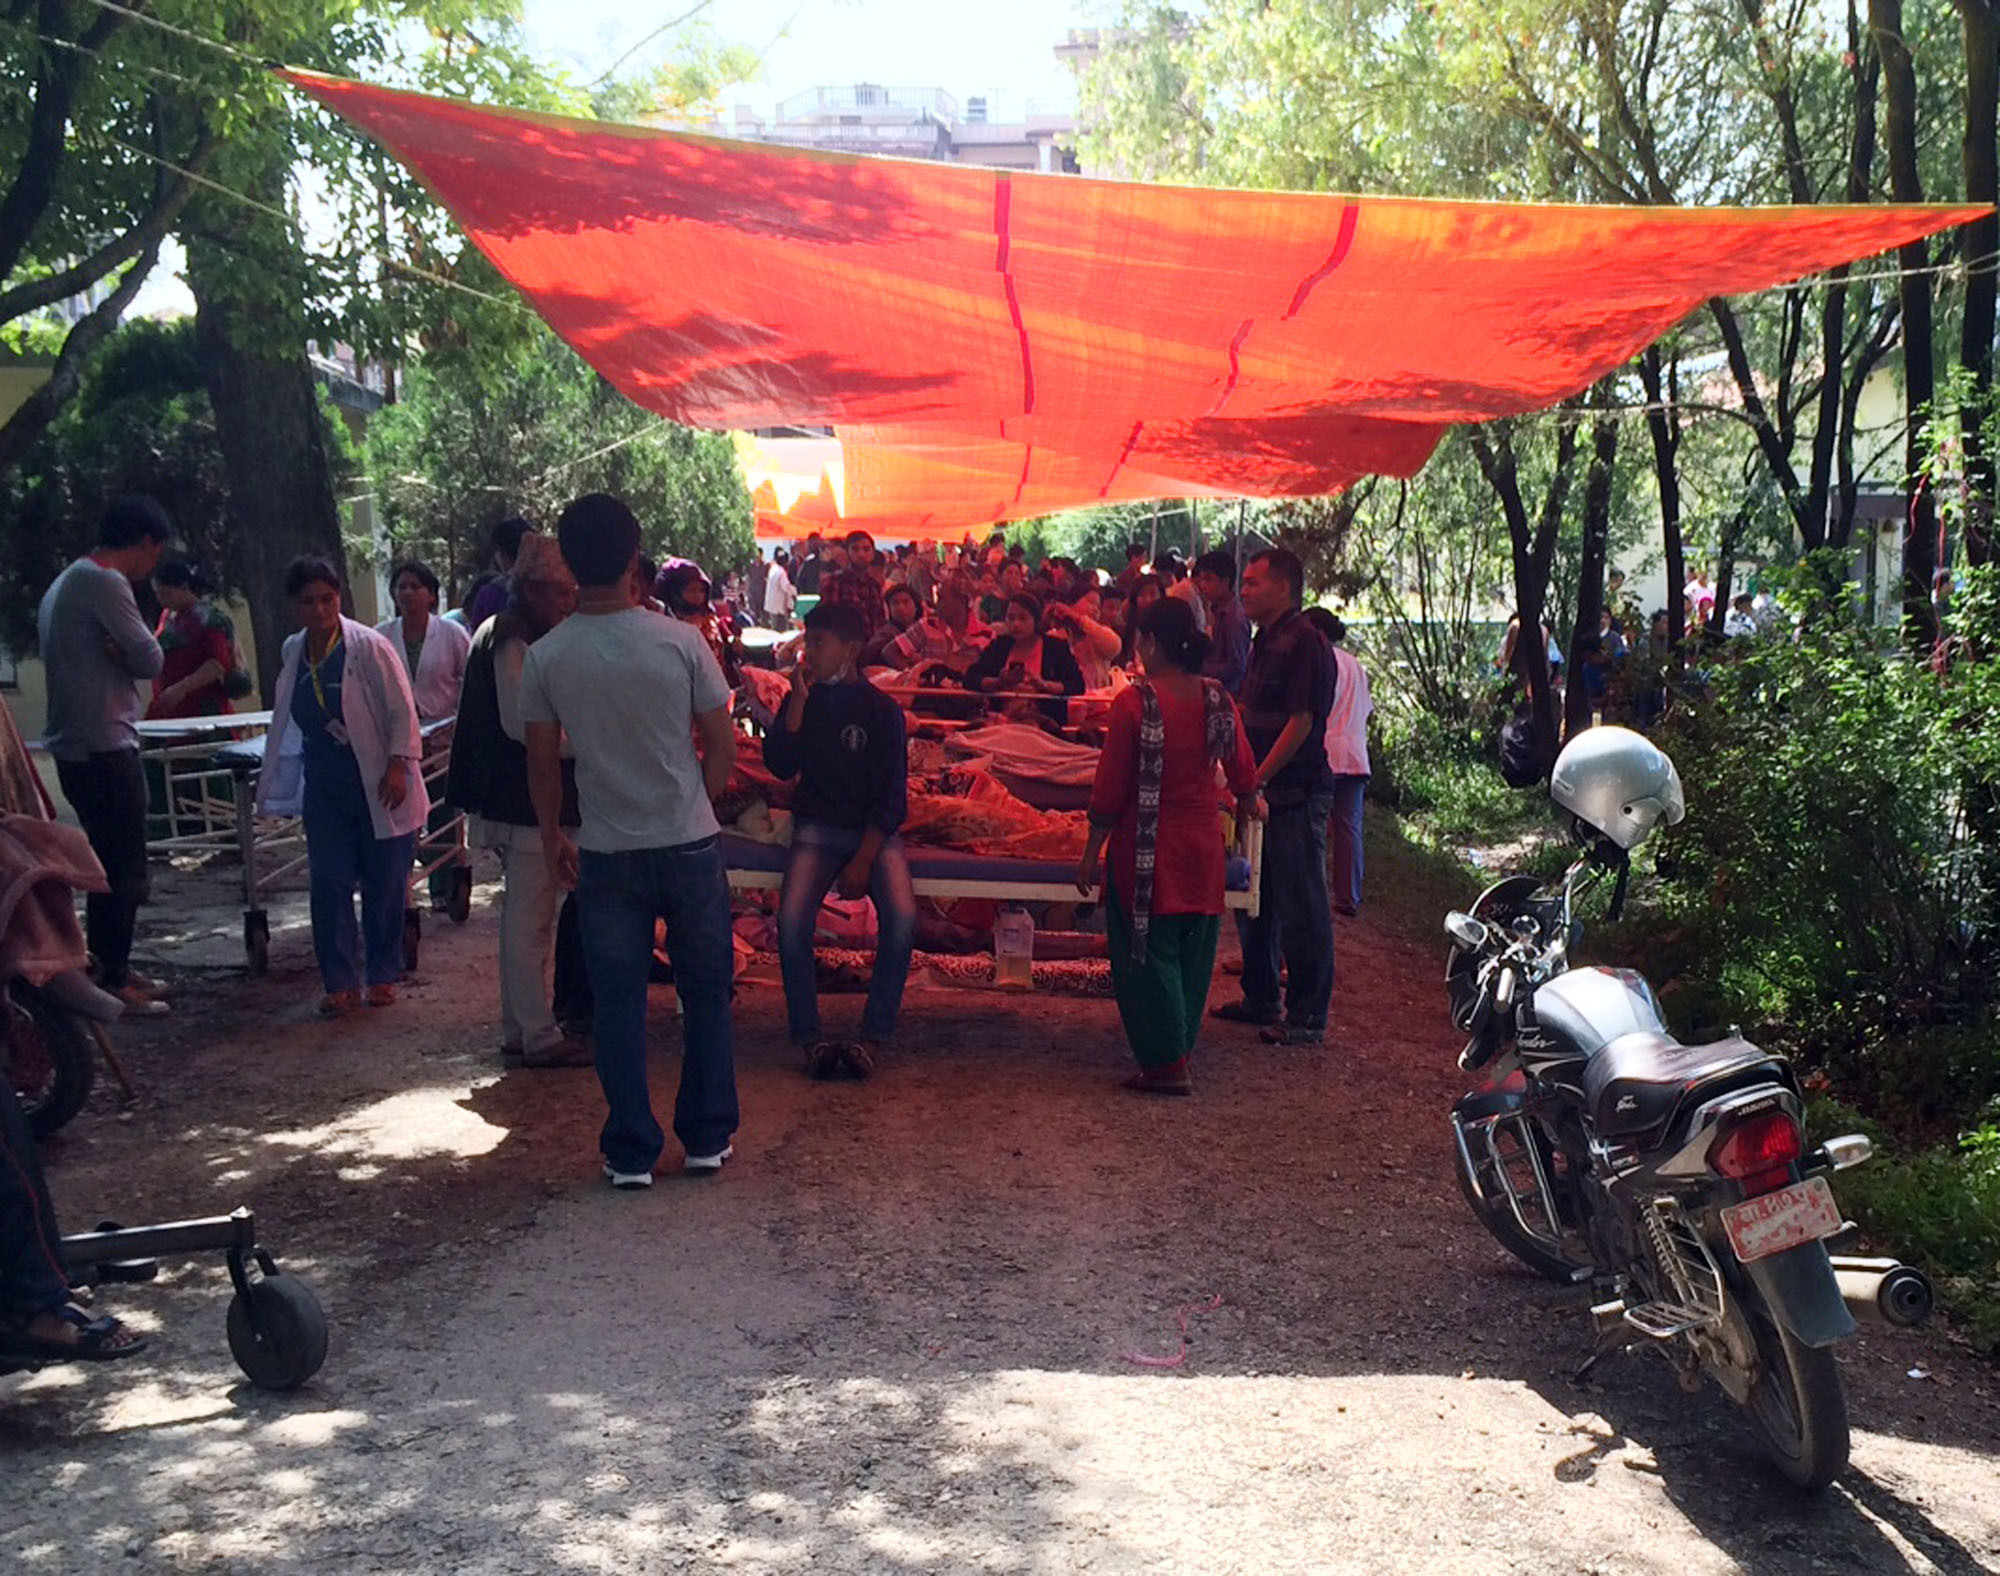 1434553619 emergency room tent